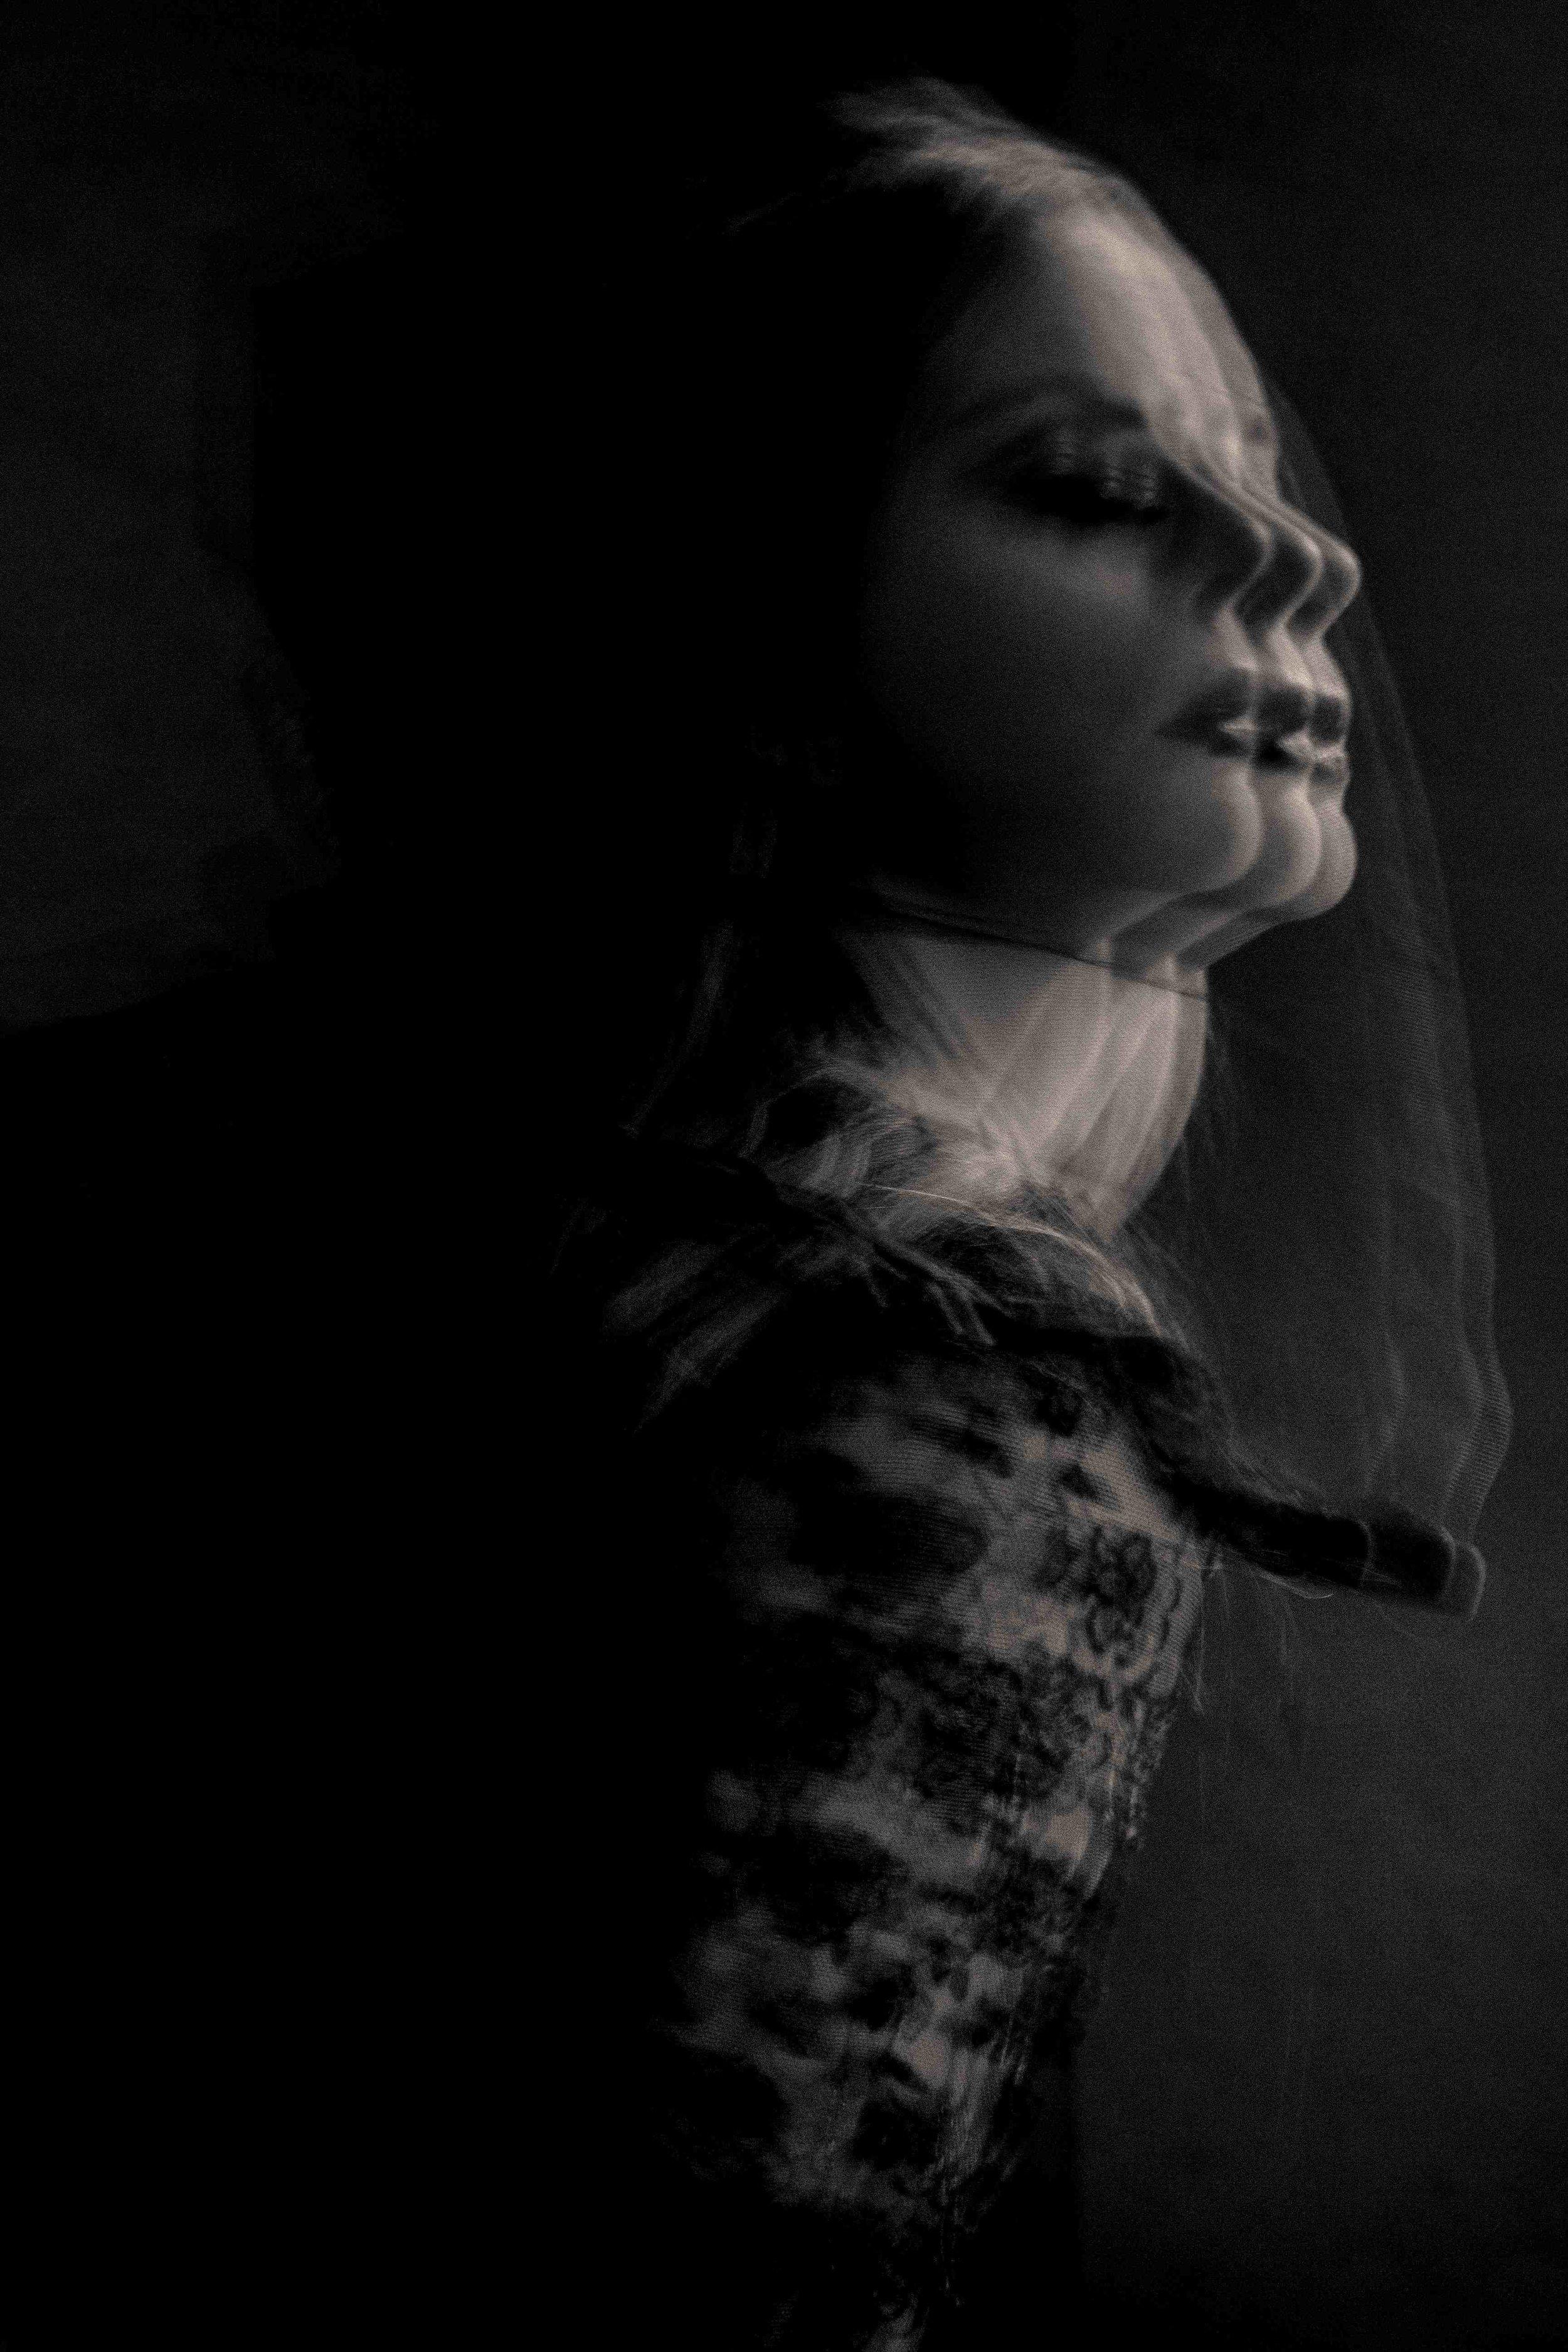 Lieselot De Wilde by Annique Konink-Burms